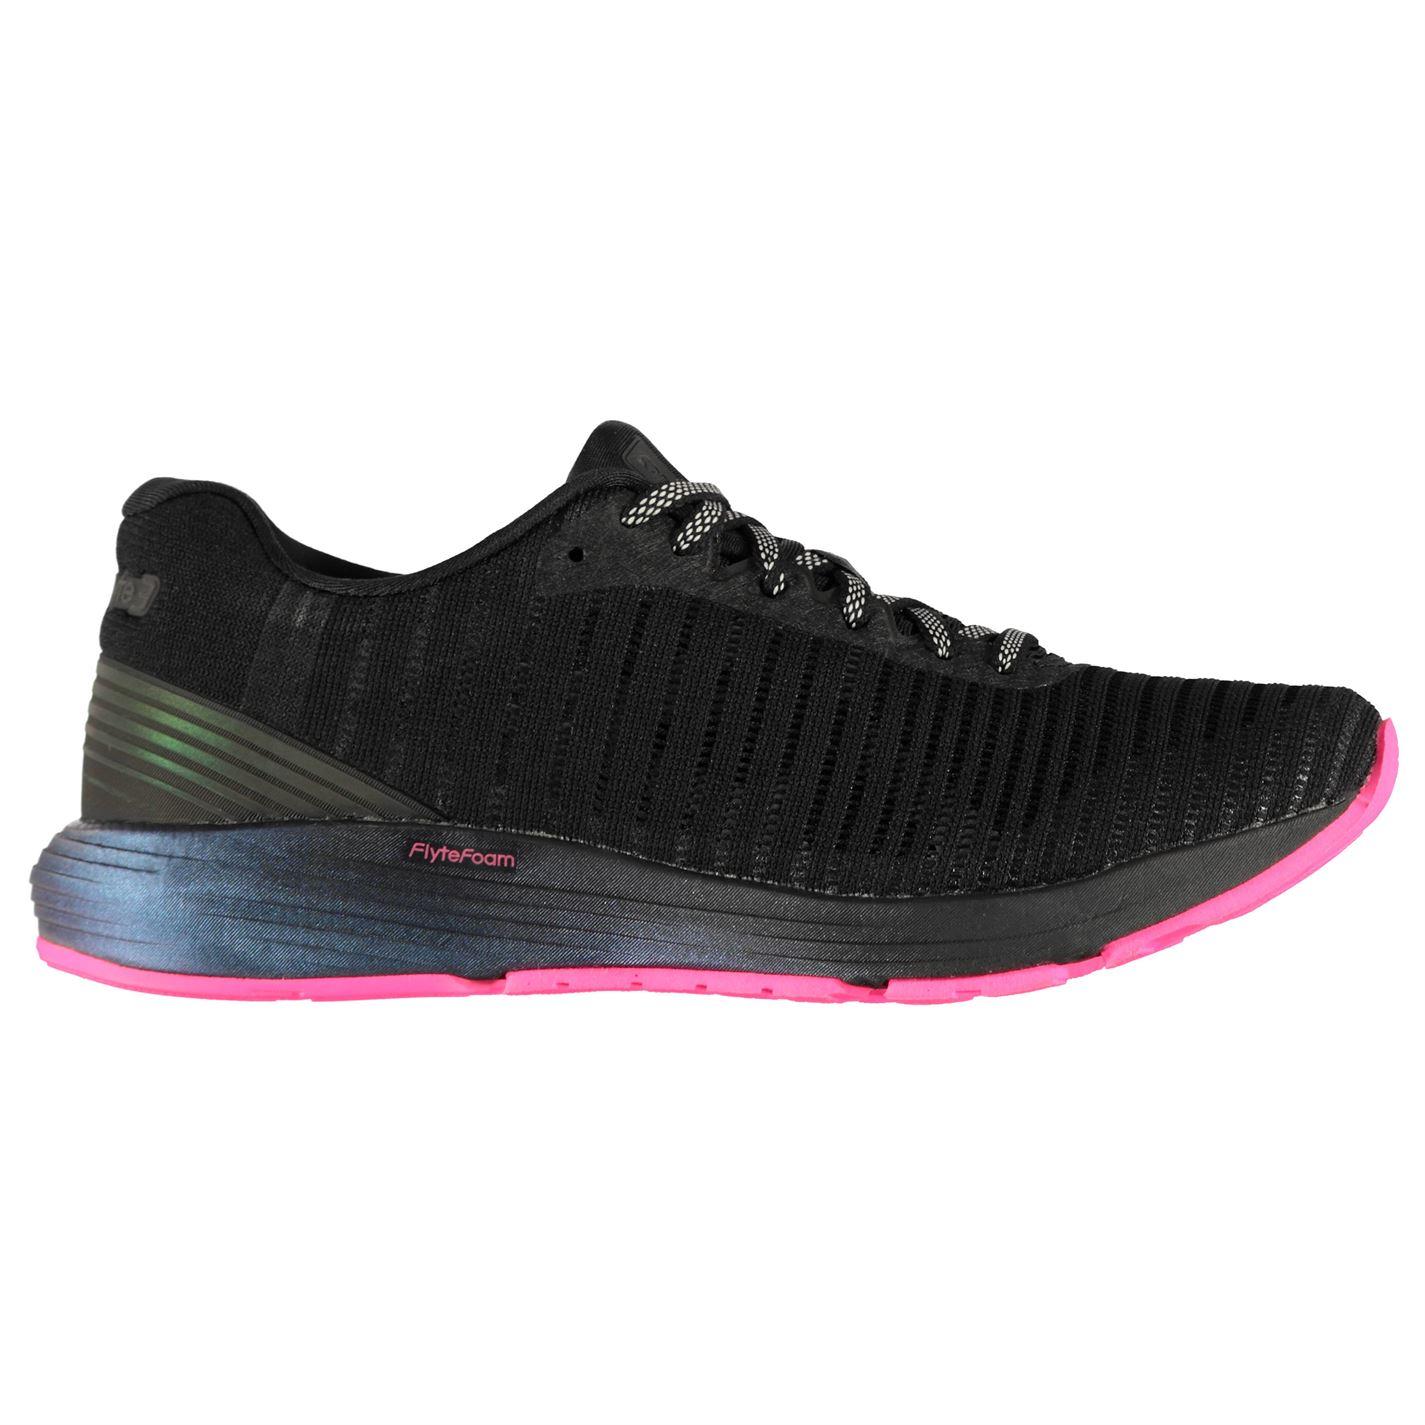 Asics DynaFlyte 3 Womens Running Shoes